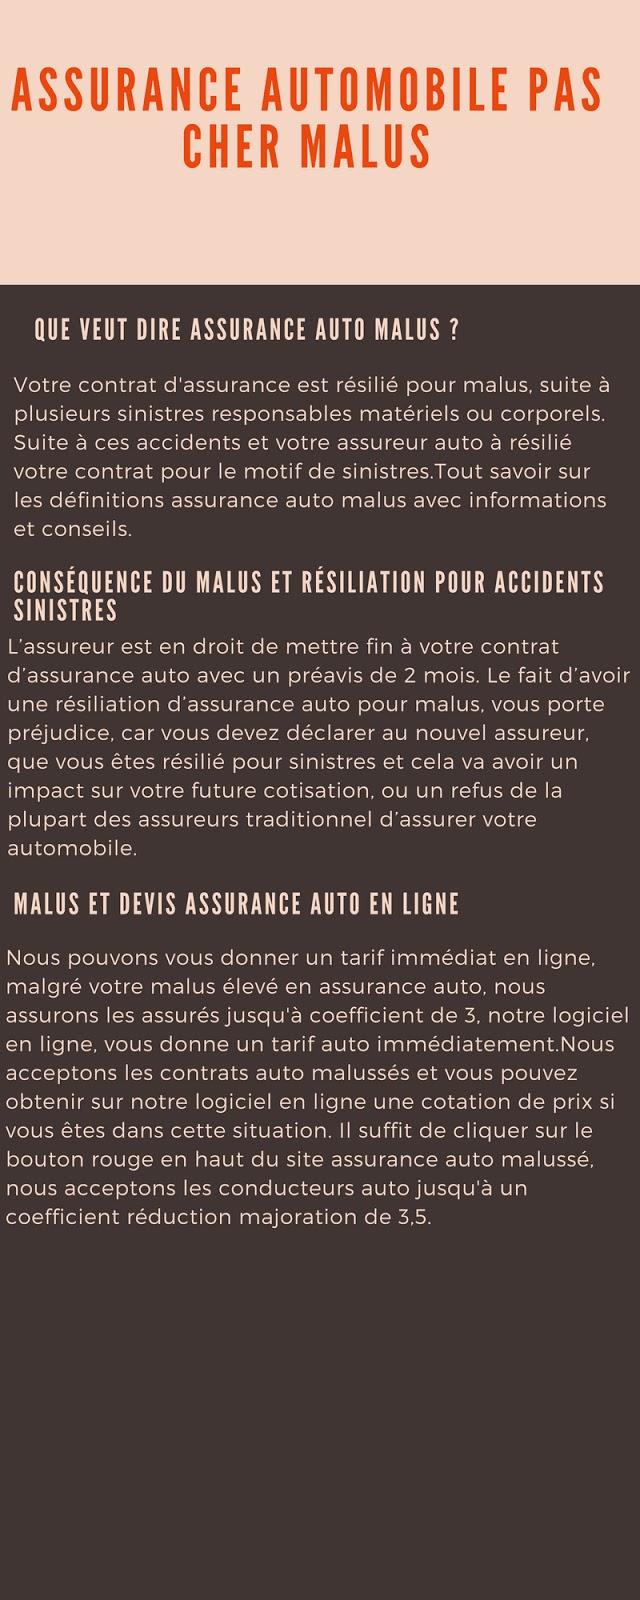 Assurance automobile malus